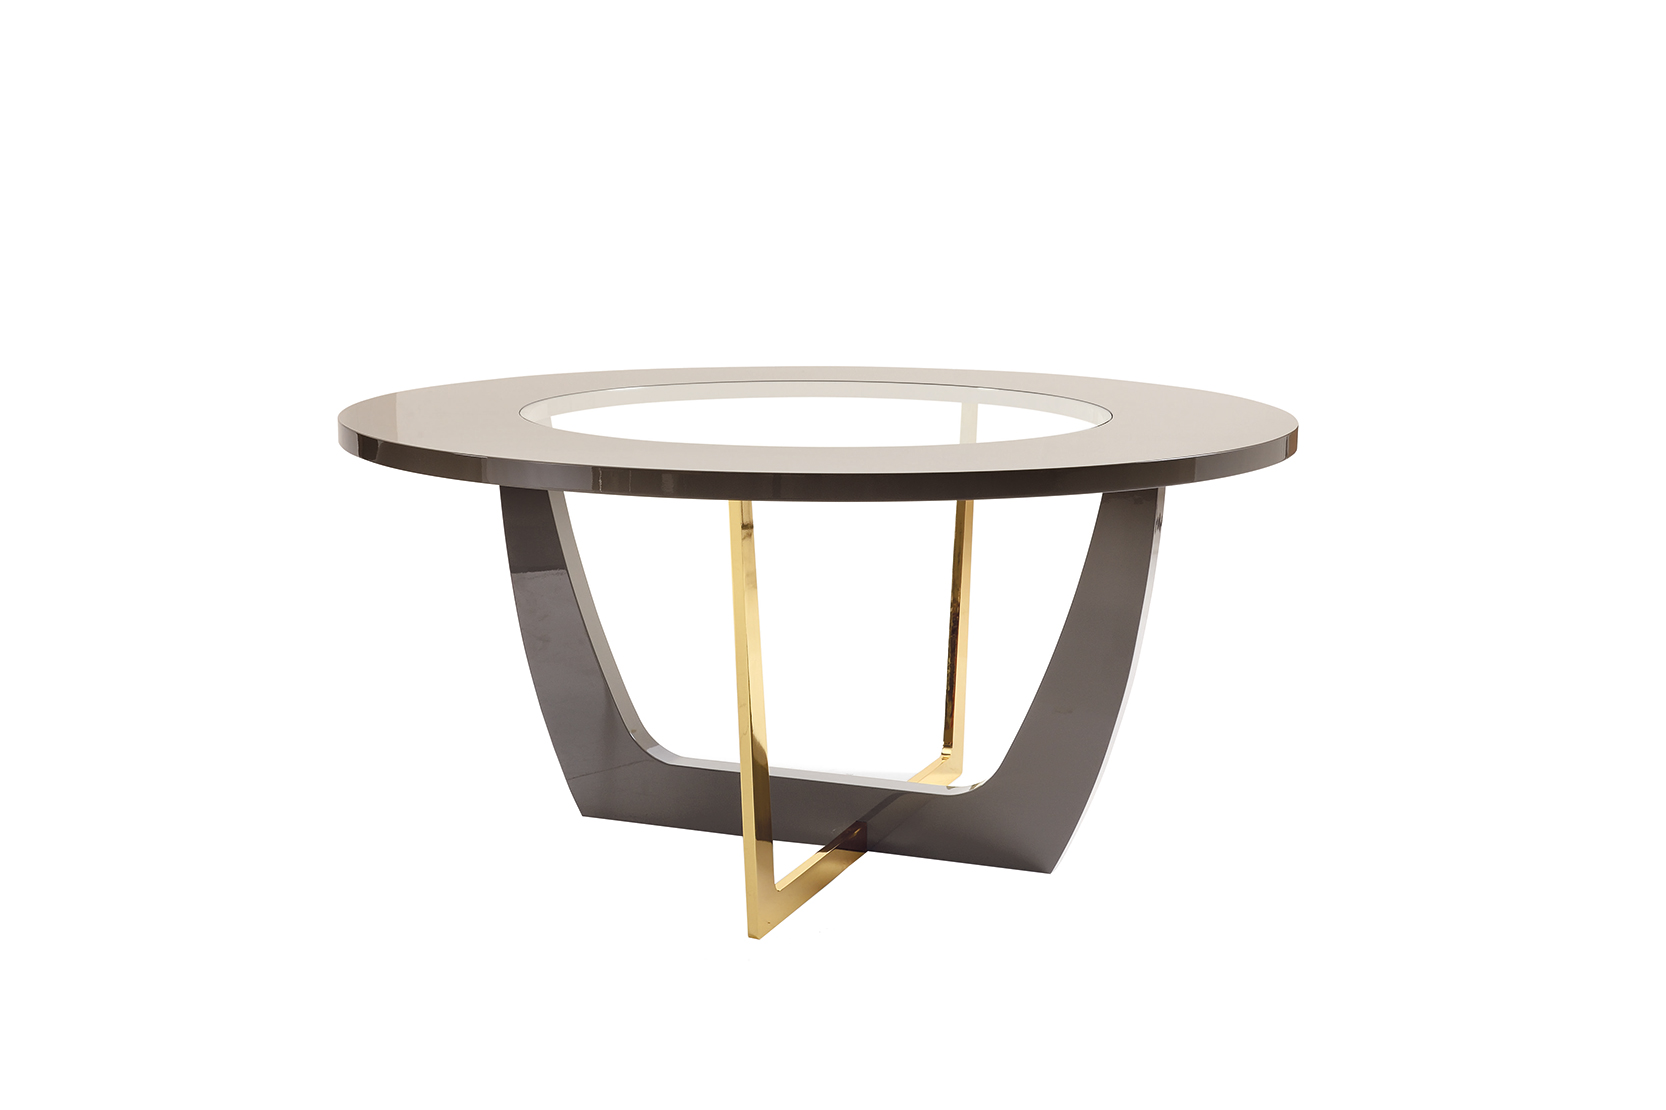 arca round dining table